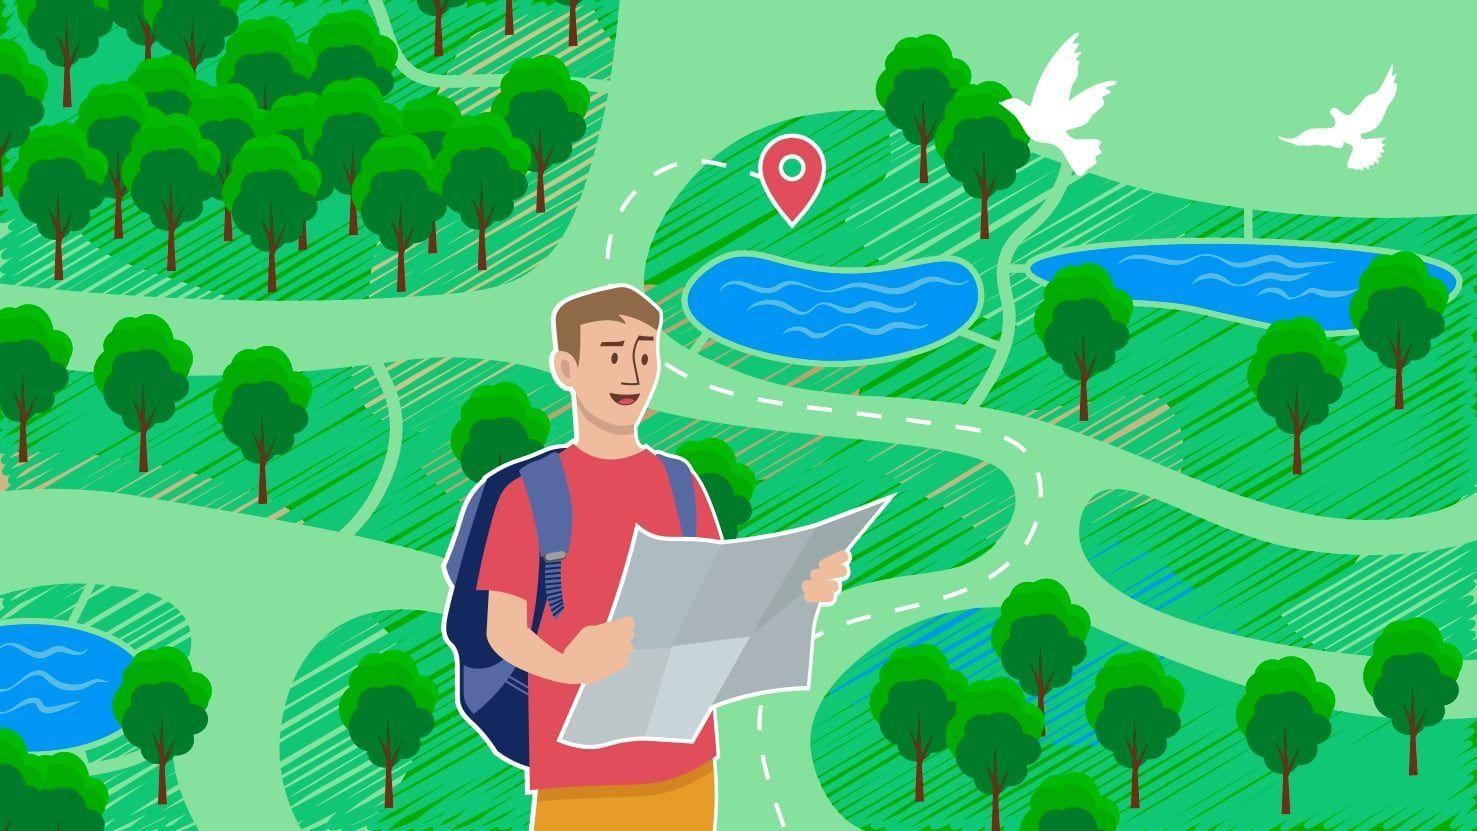 The Video SDK roadmap for Q3 2021